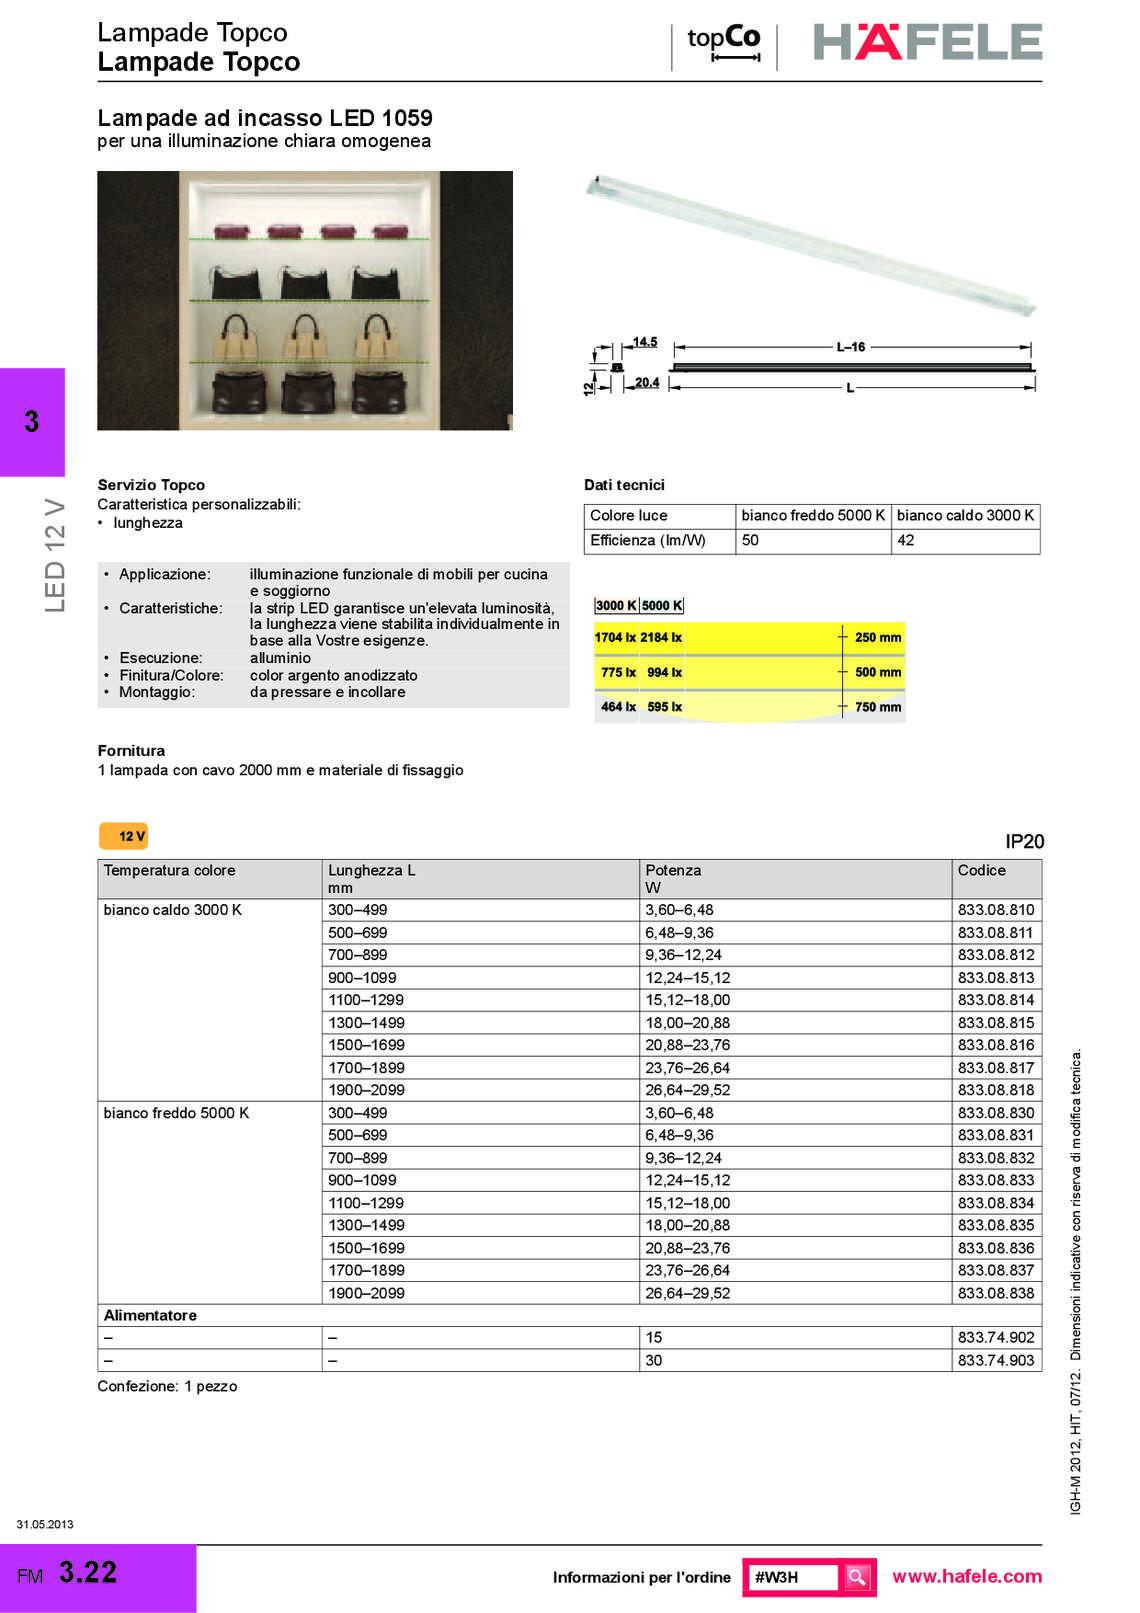 hafele-prodotti-su-misura_81_035.jpg